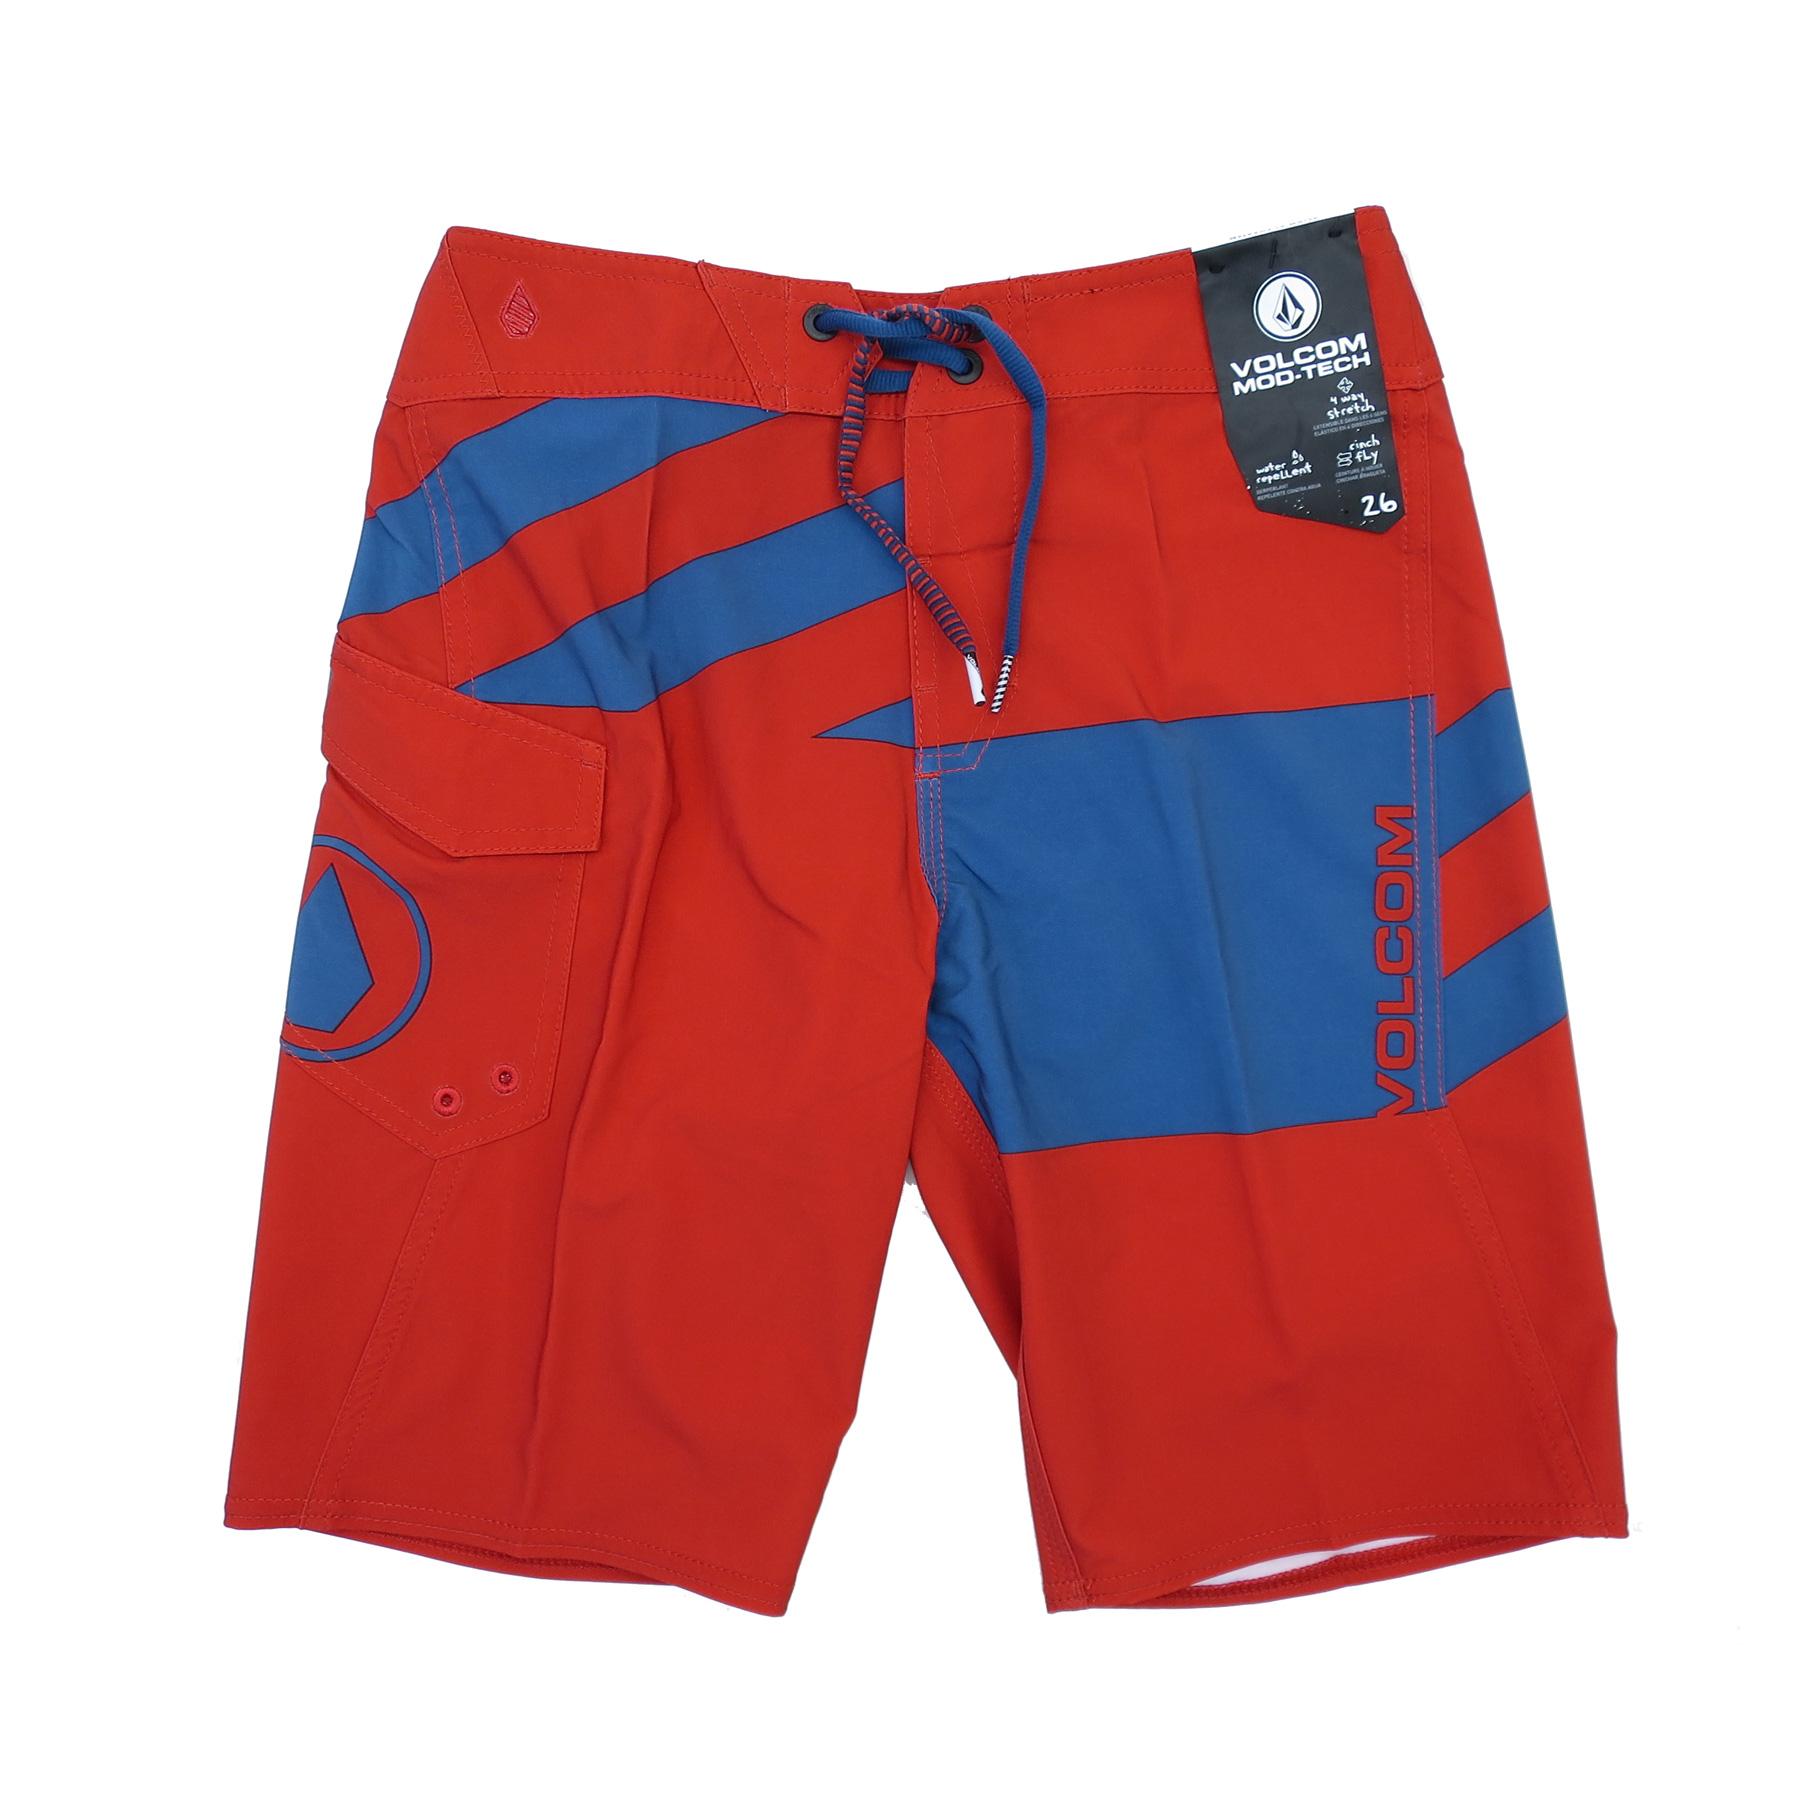 ae7e42389b ... Volcom · Boardshorts. Sale. logo-party-pack-mod-c0811735-tof